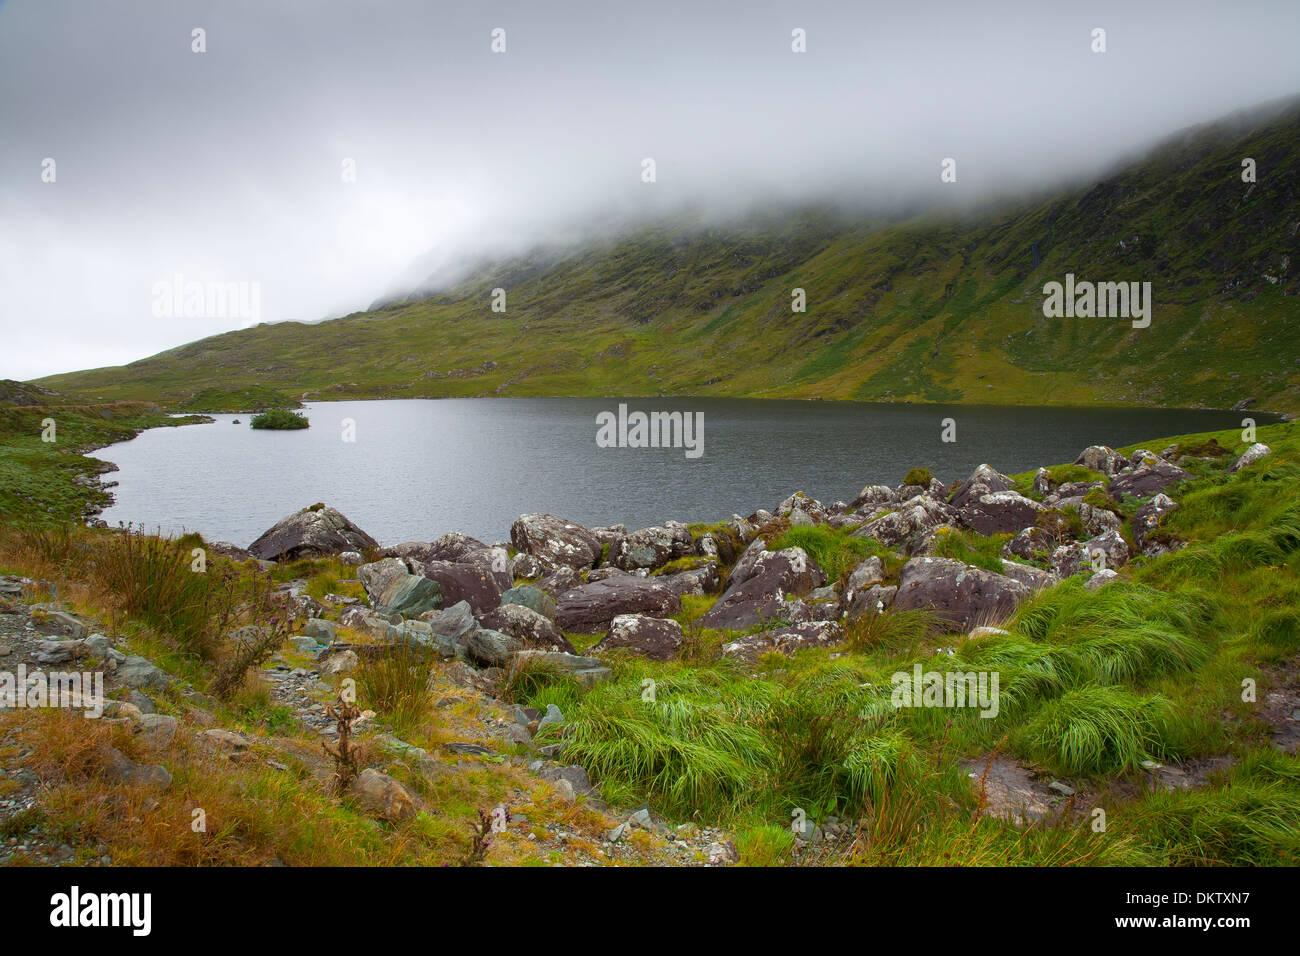 Barfinnihy Lake. Ring of Kerry County Kerry, Ireland, Europe. - Stock Image